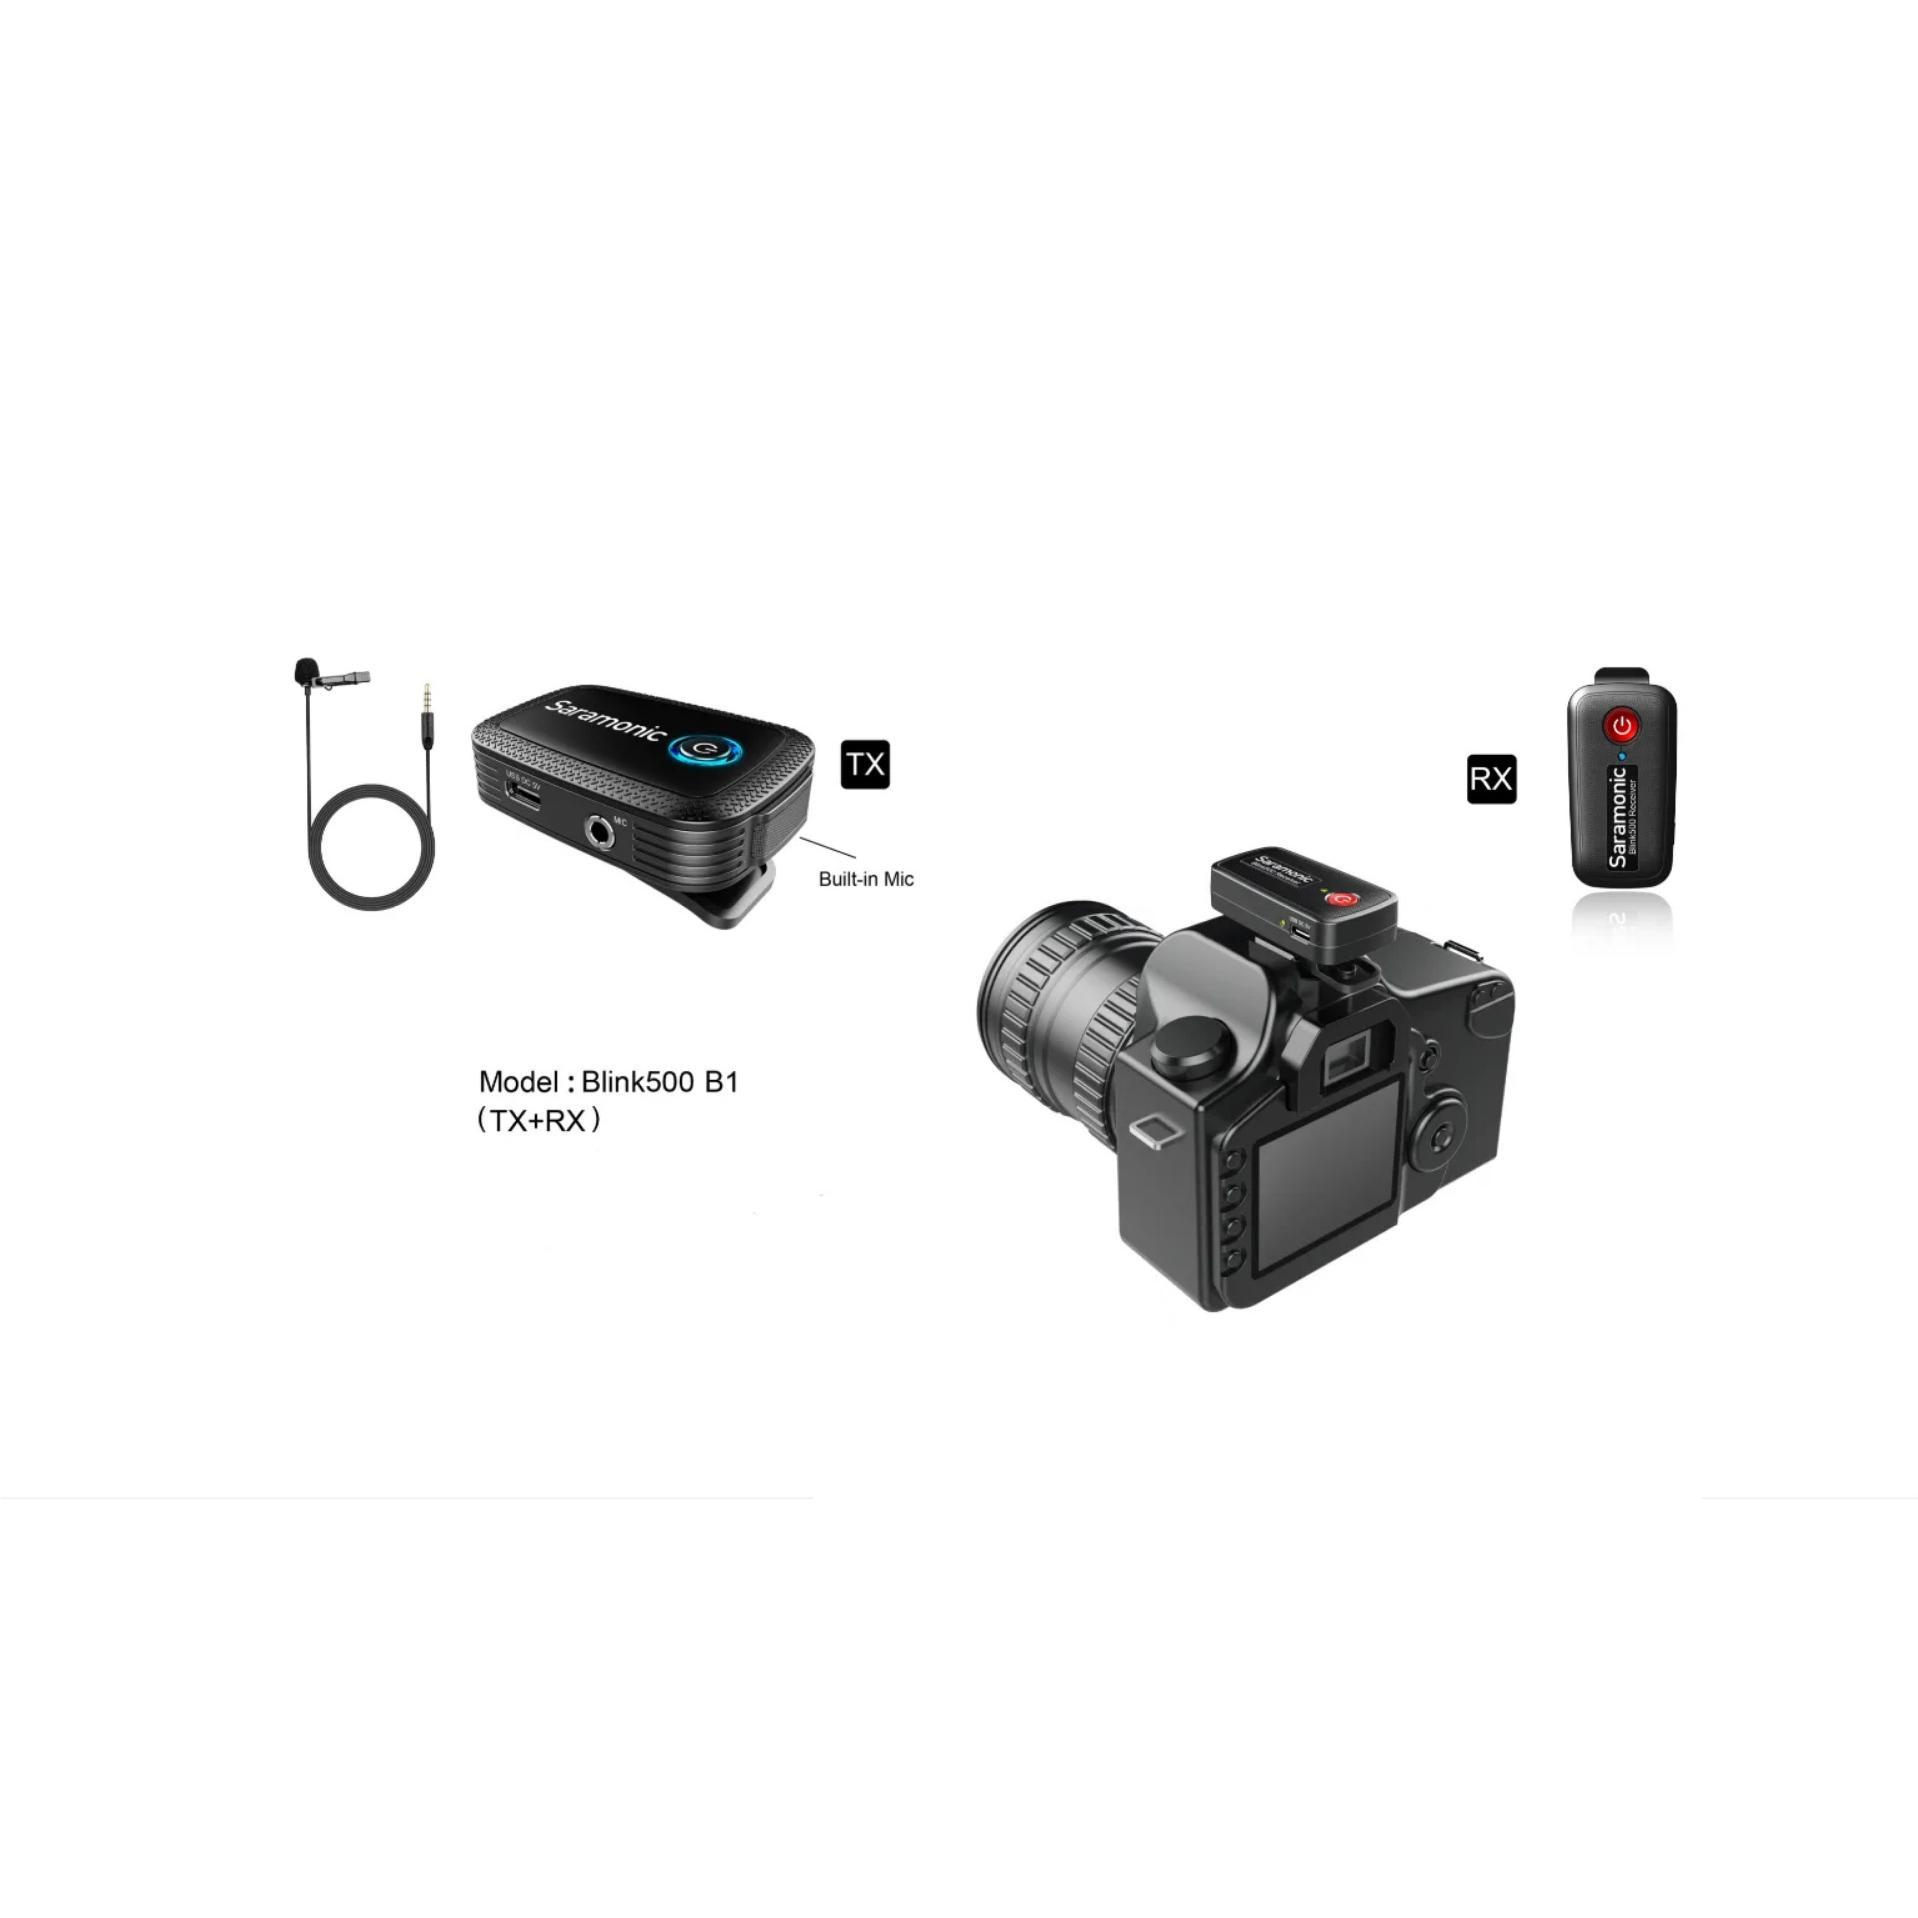 SARAMONIC BLINK500 B1 Wireless CLIP-ON TX+RX   Fdirect.eu - B2B only